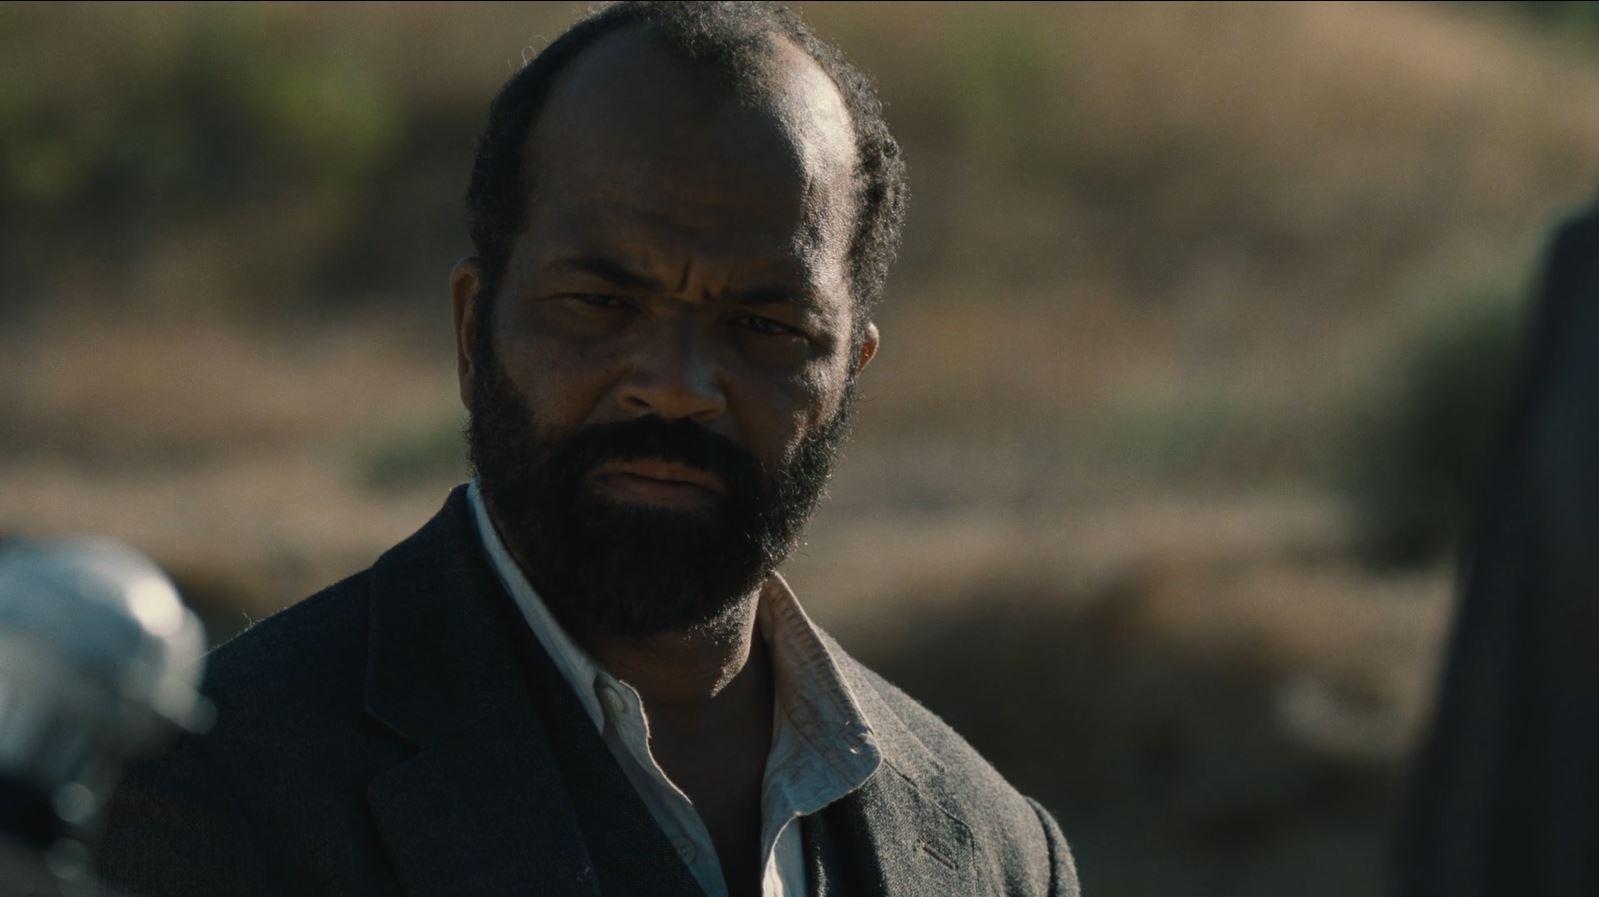 Westworld S02E01 Journey into Night Review - Jeffrey Wright as Bernard